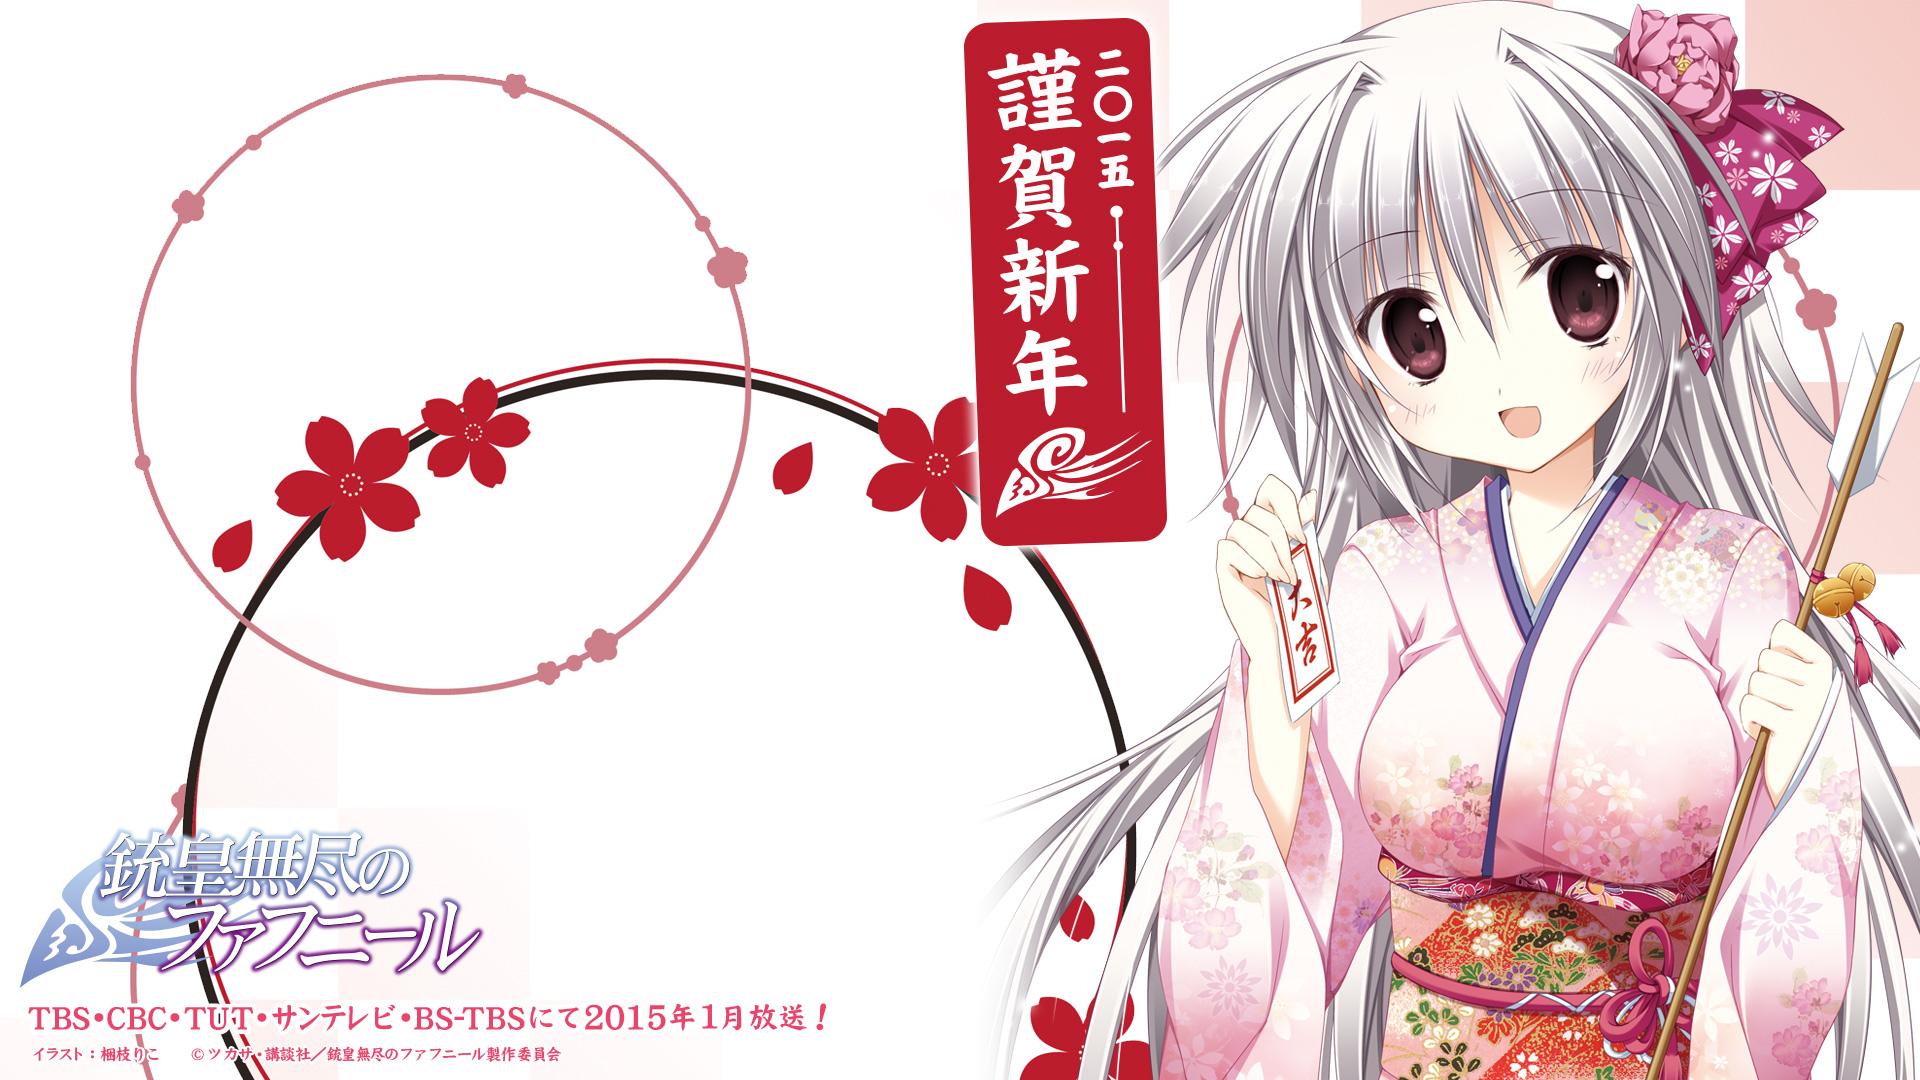 2015 New Year Greetings Anime Style haruhichan.com Juuou Mujin no Fafnir